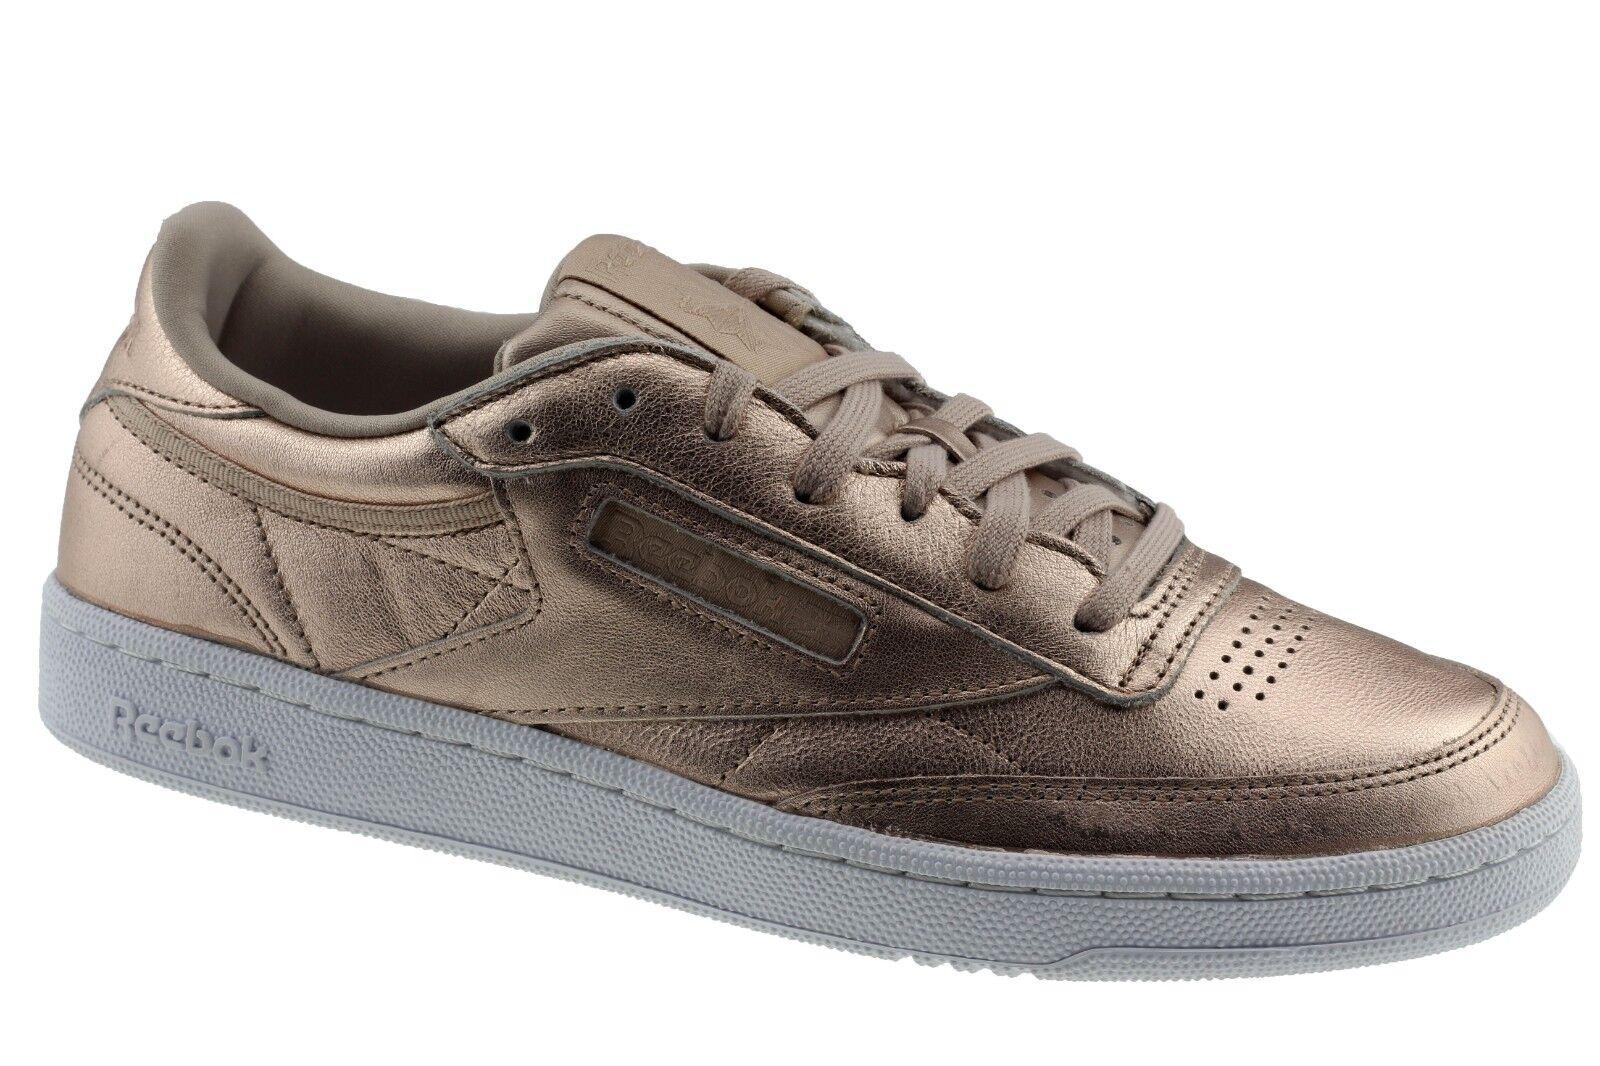 Reebok Reebok Reebok BS7899 Club C 85 Melted Metal Bronze Damen Damens Sneaker 5baa40